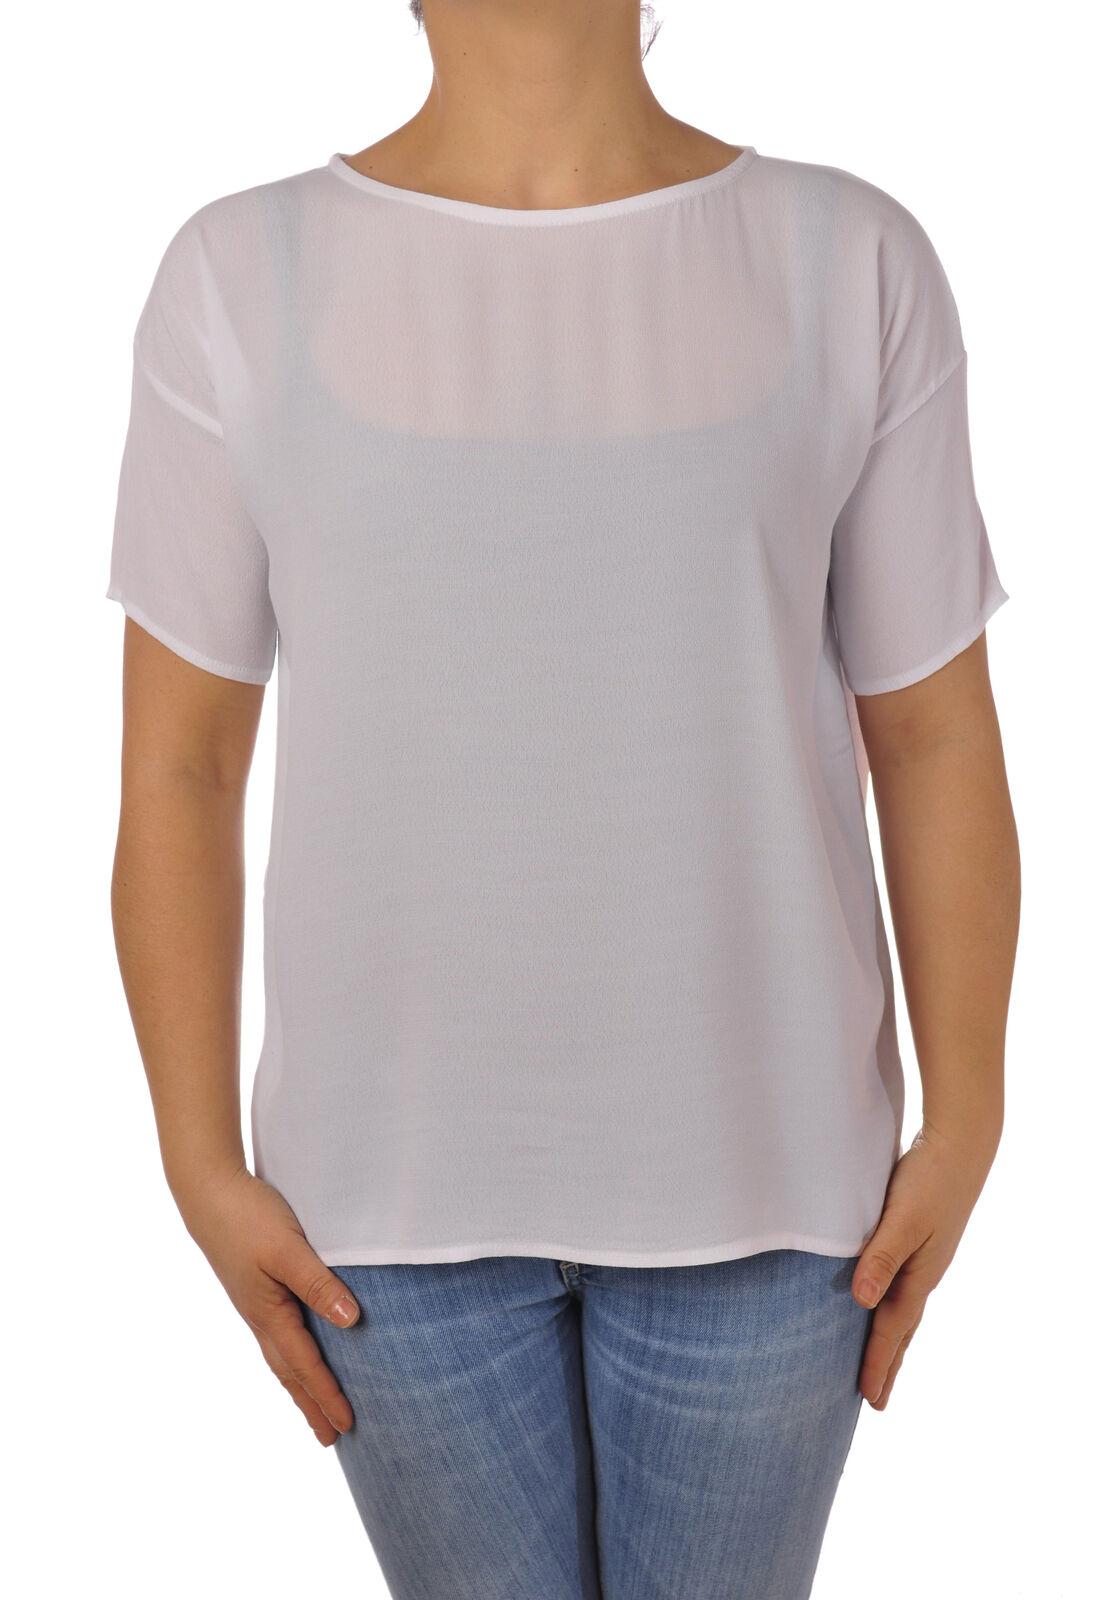 CROSSLEY - Shirts-Blouses - Woman - White - 5087020F183823